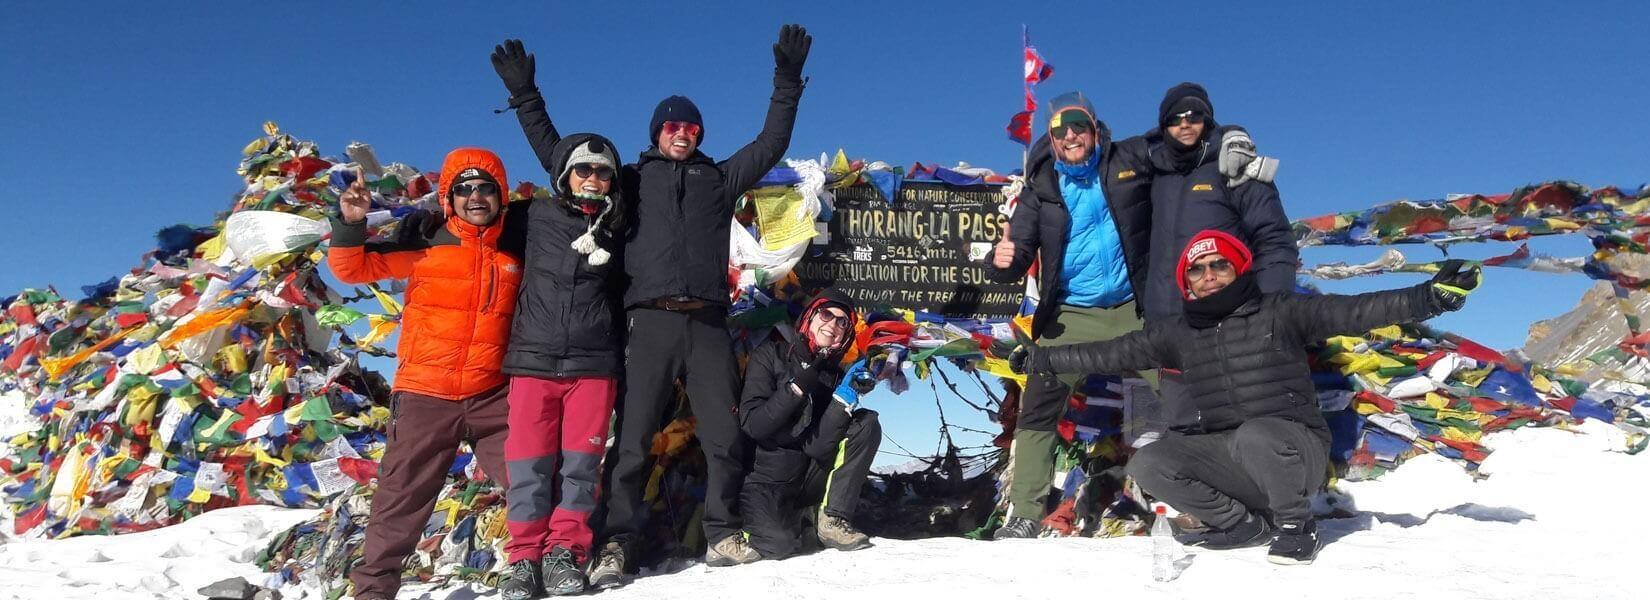 Thorong-la Pass Annapurna